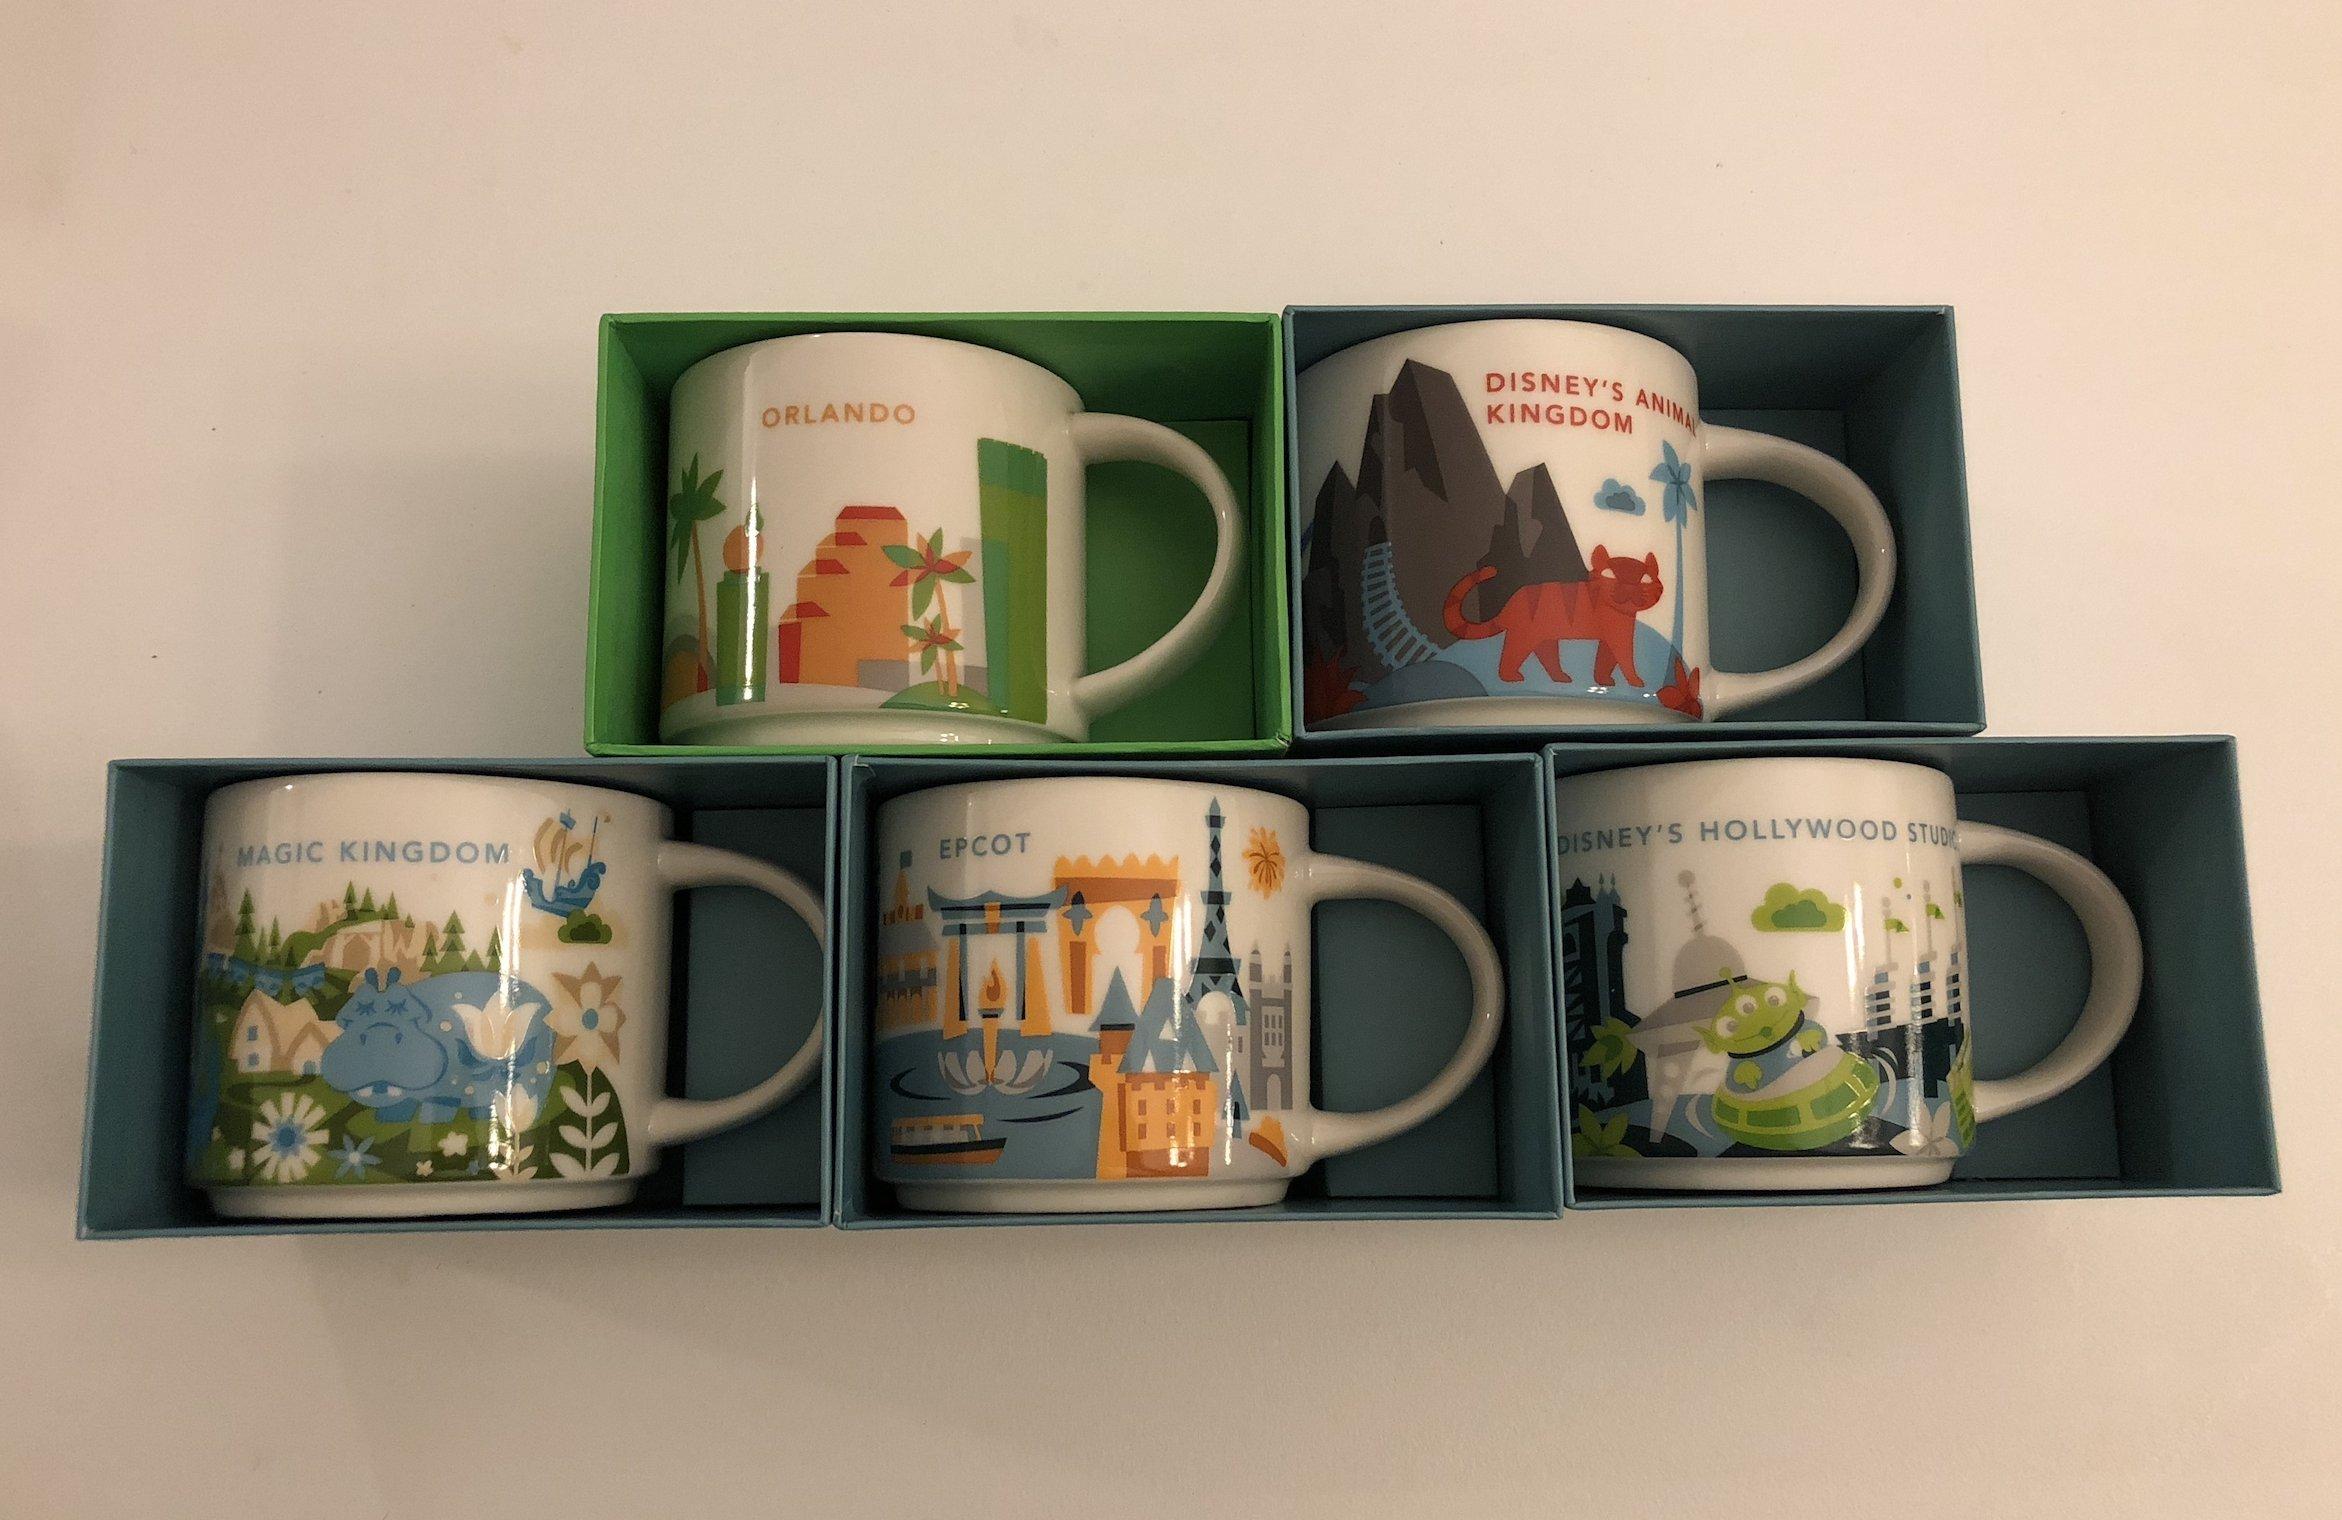 5 Mug Set: 2017 Animal Kingdom, Magic Kingdom, EPCOT, Disney's Hollywood Studios, Orlando Starbucks You Are Here 14 Oz. Mugs